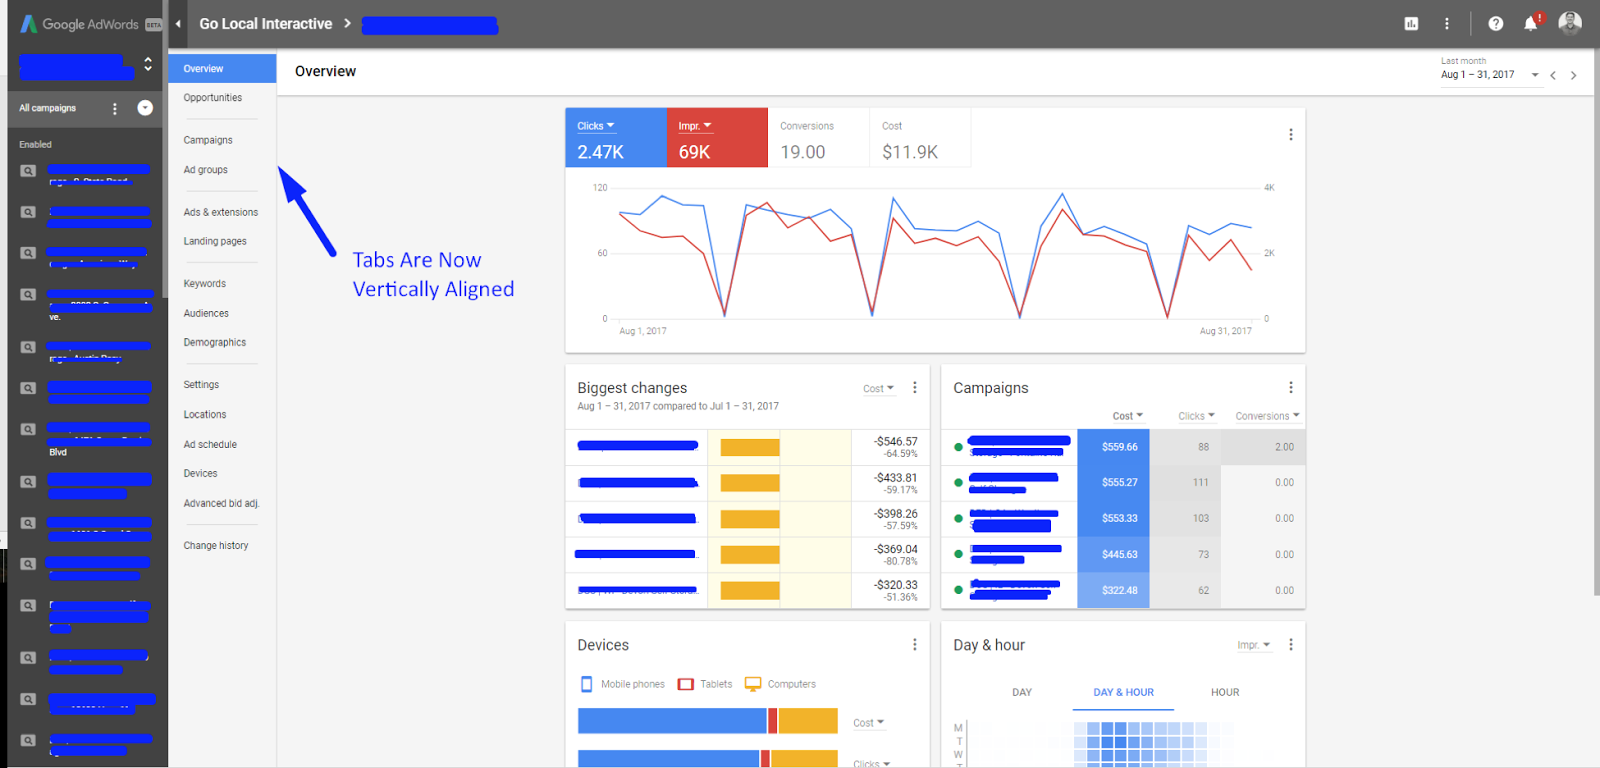 New Google AdWords dashboard